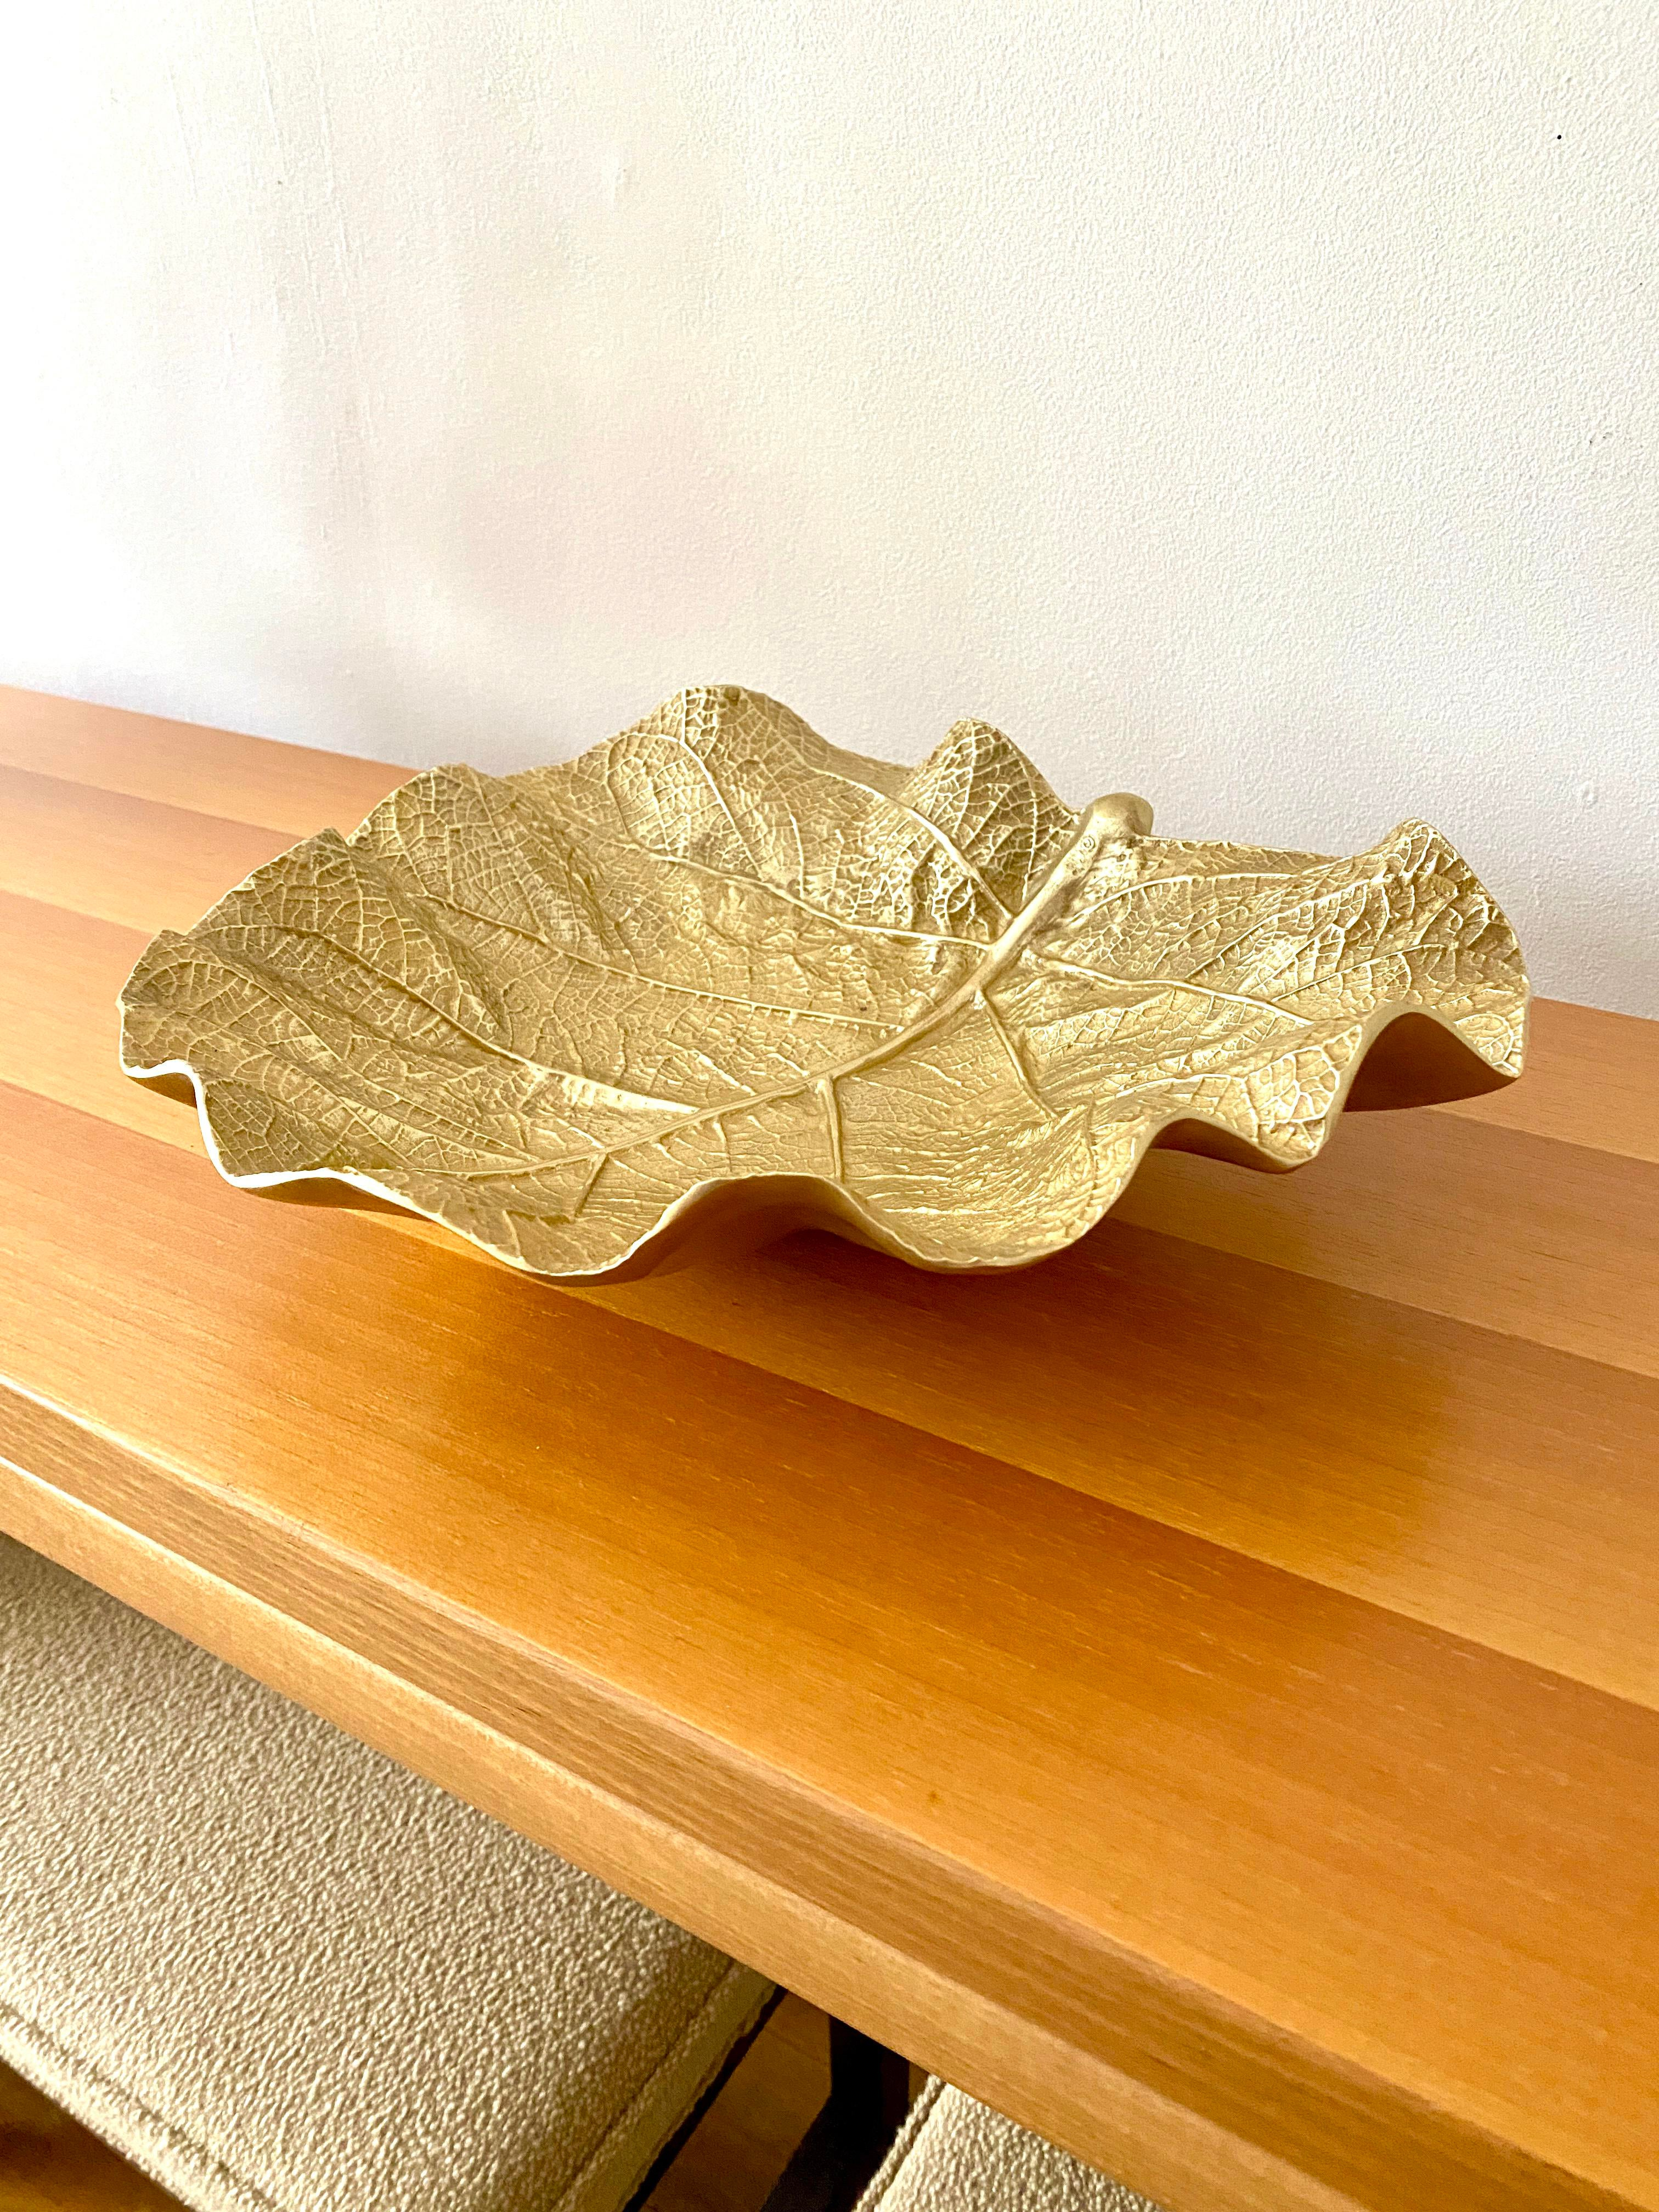 1945 Virginia Metalcrafters Sea Grape Leaf BowlDish #3513 Gold Anodized Cast Aluminum Large 13.5\u201d Vintage Mid-Century